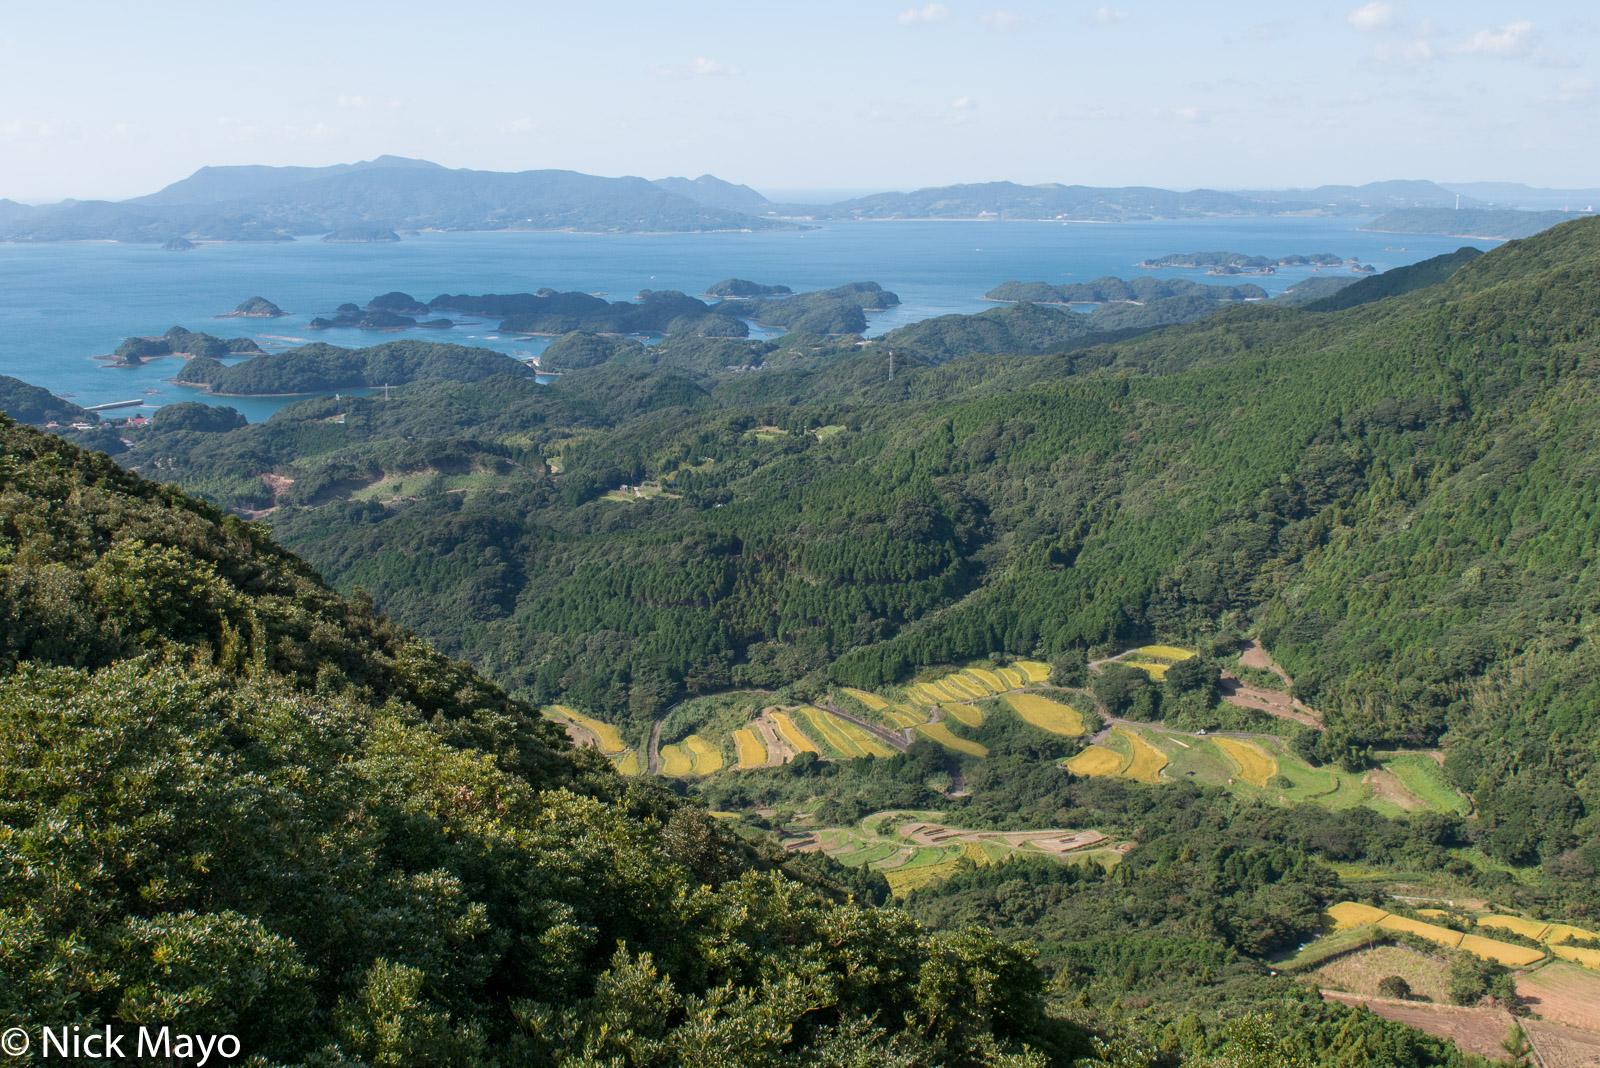 Japan,Kyushu,Paddy, photo